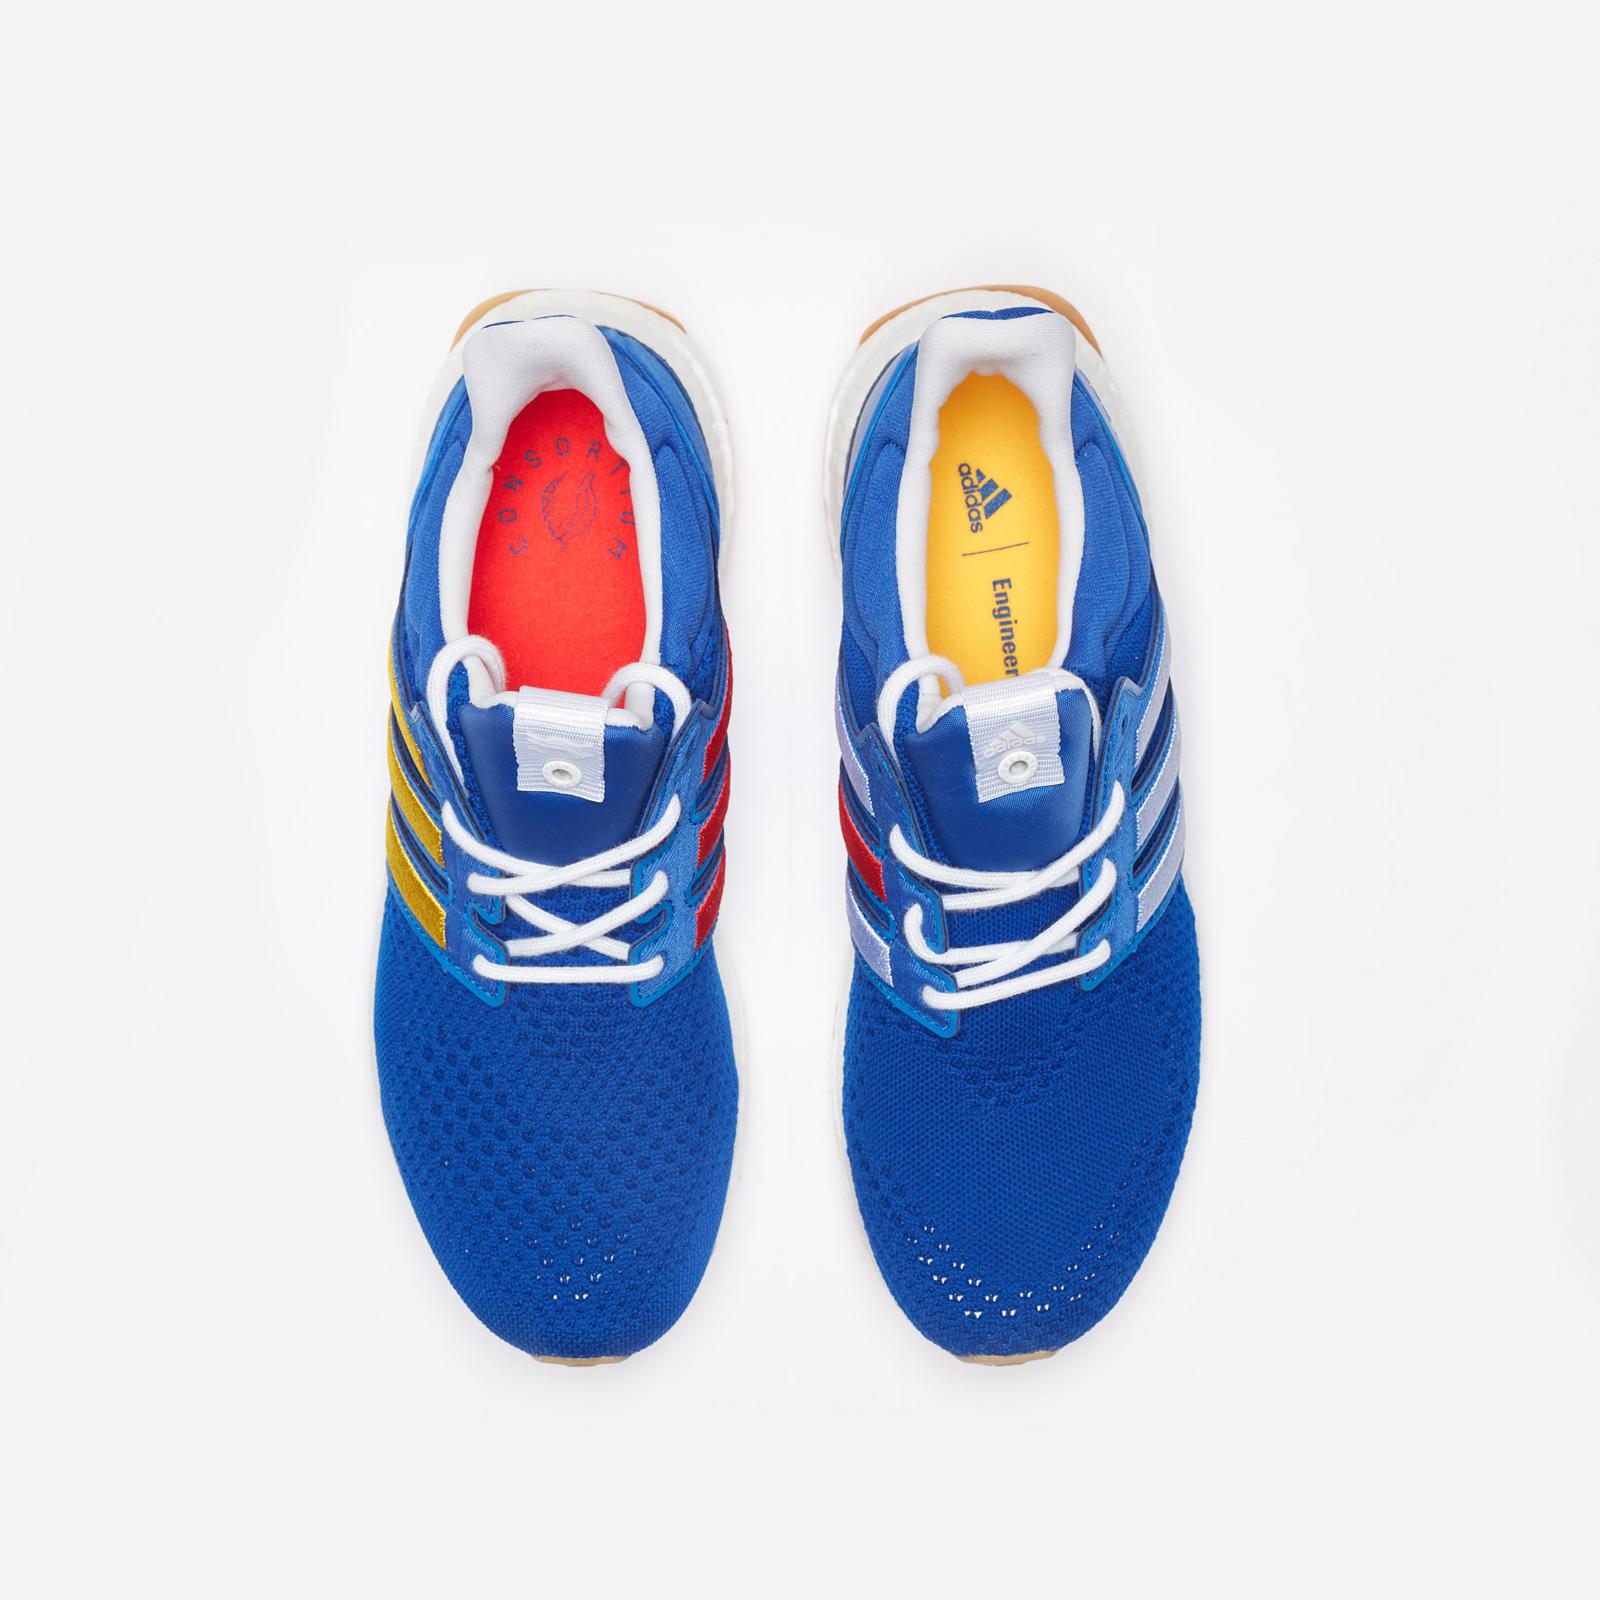 590253227e63e adidas UltraBOOST E.G - Bc0949 - Sneakersnstuff